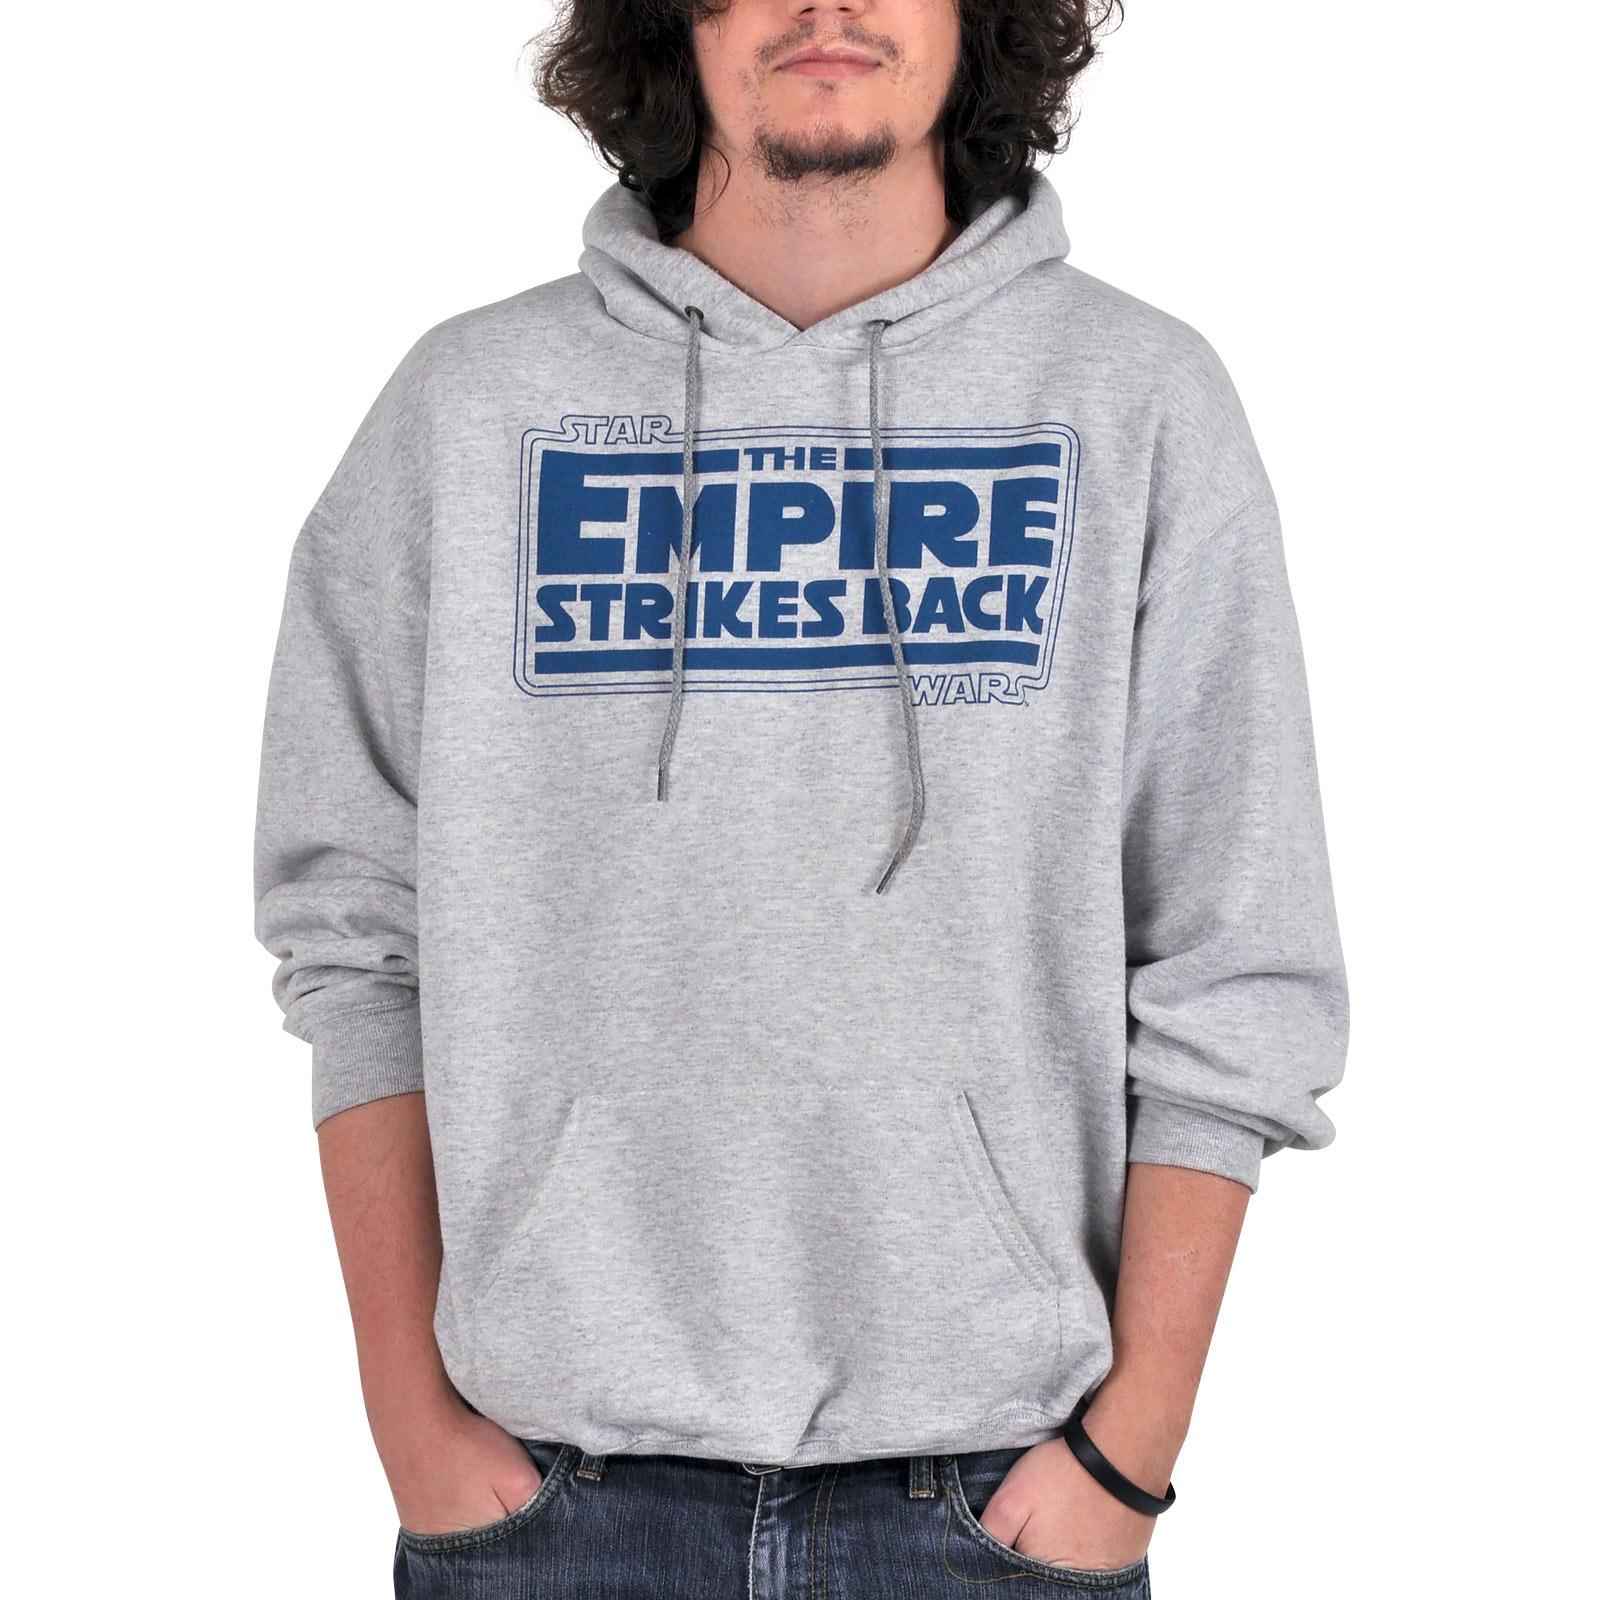 Star Wars - The Empire Strikes Back Hoodie